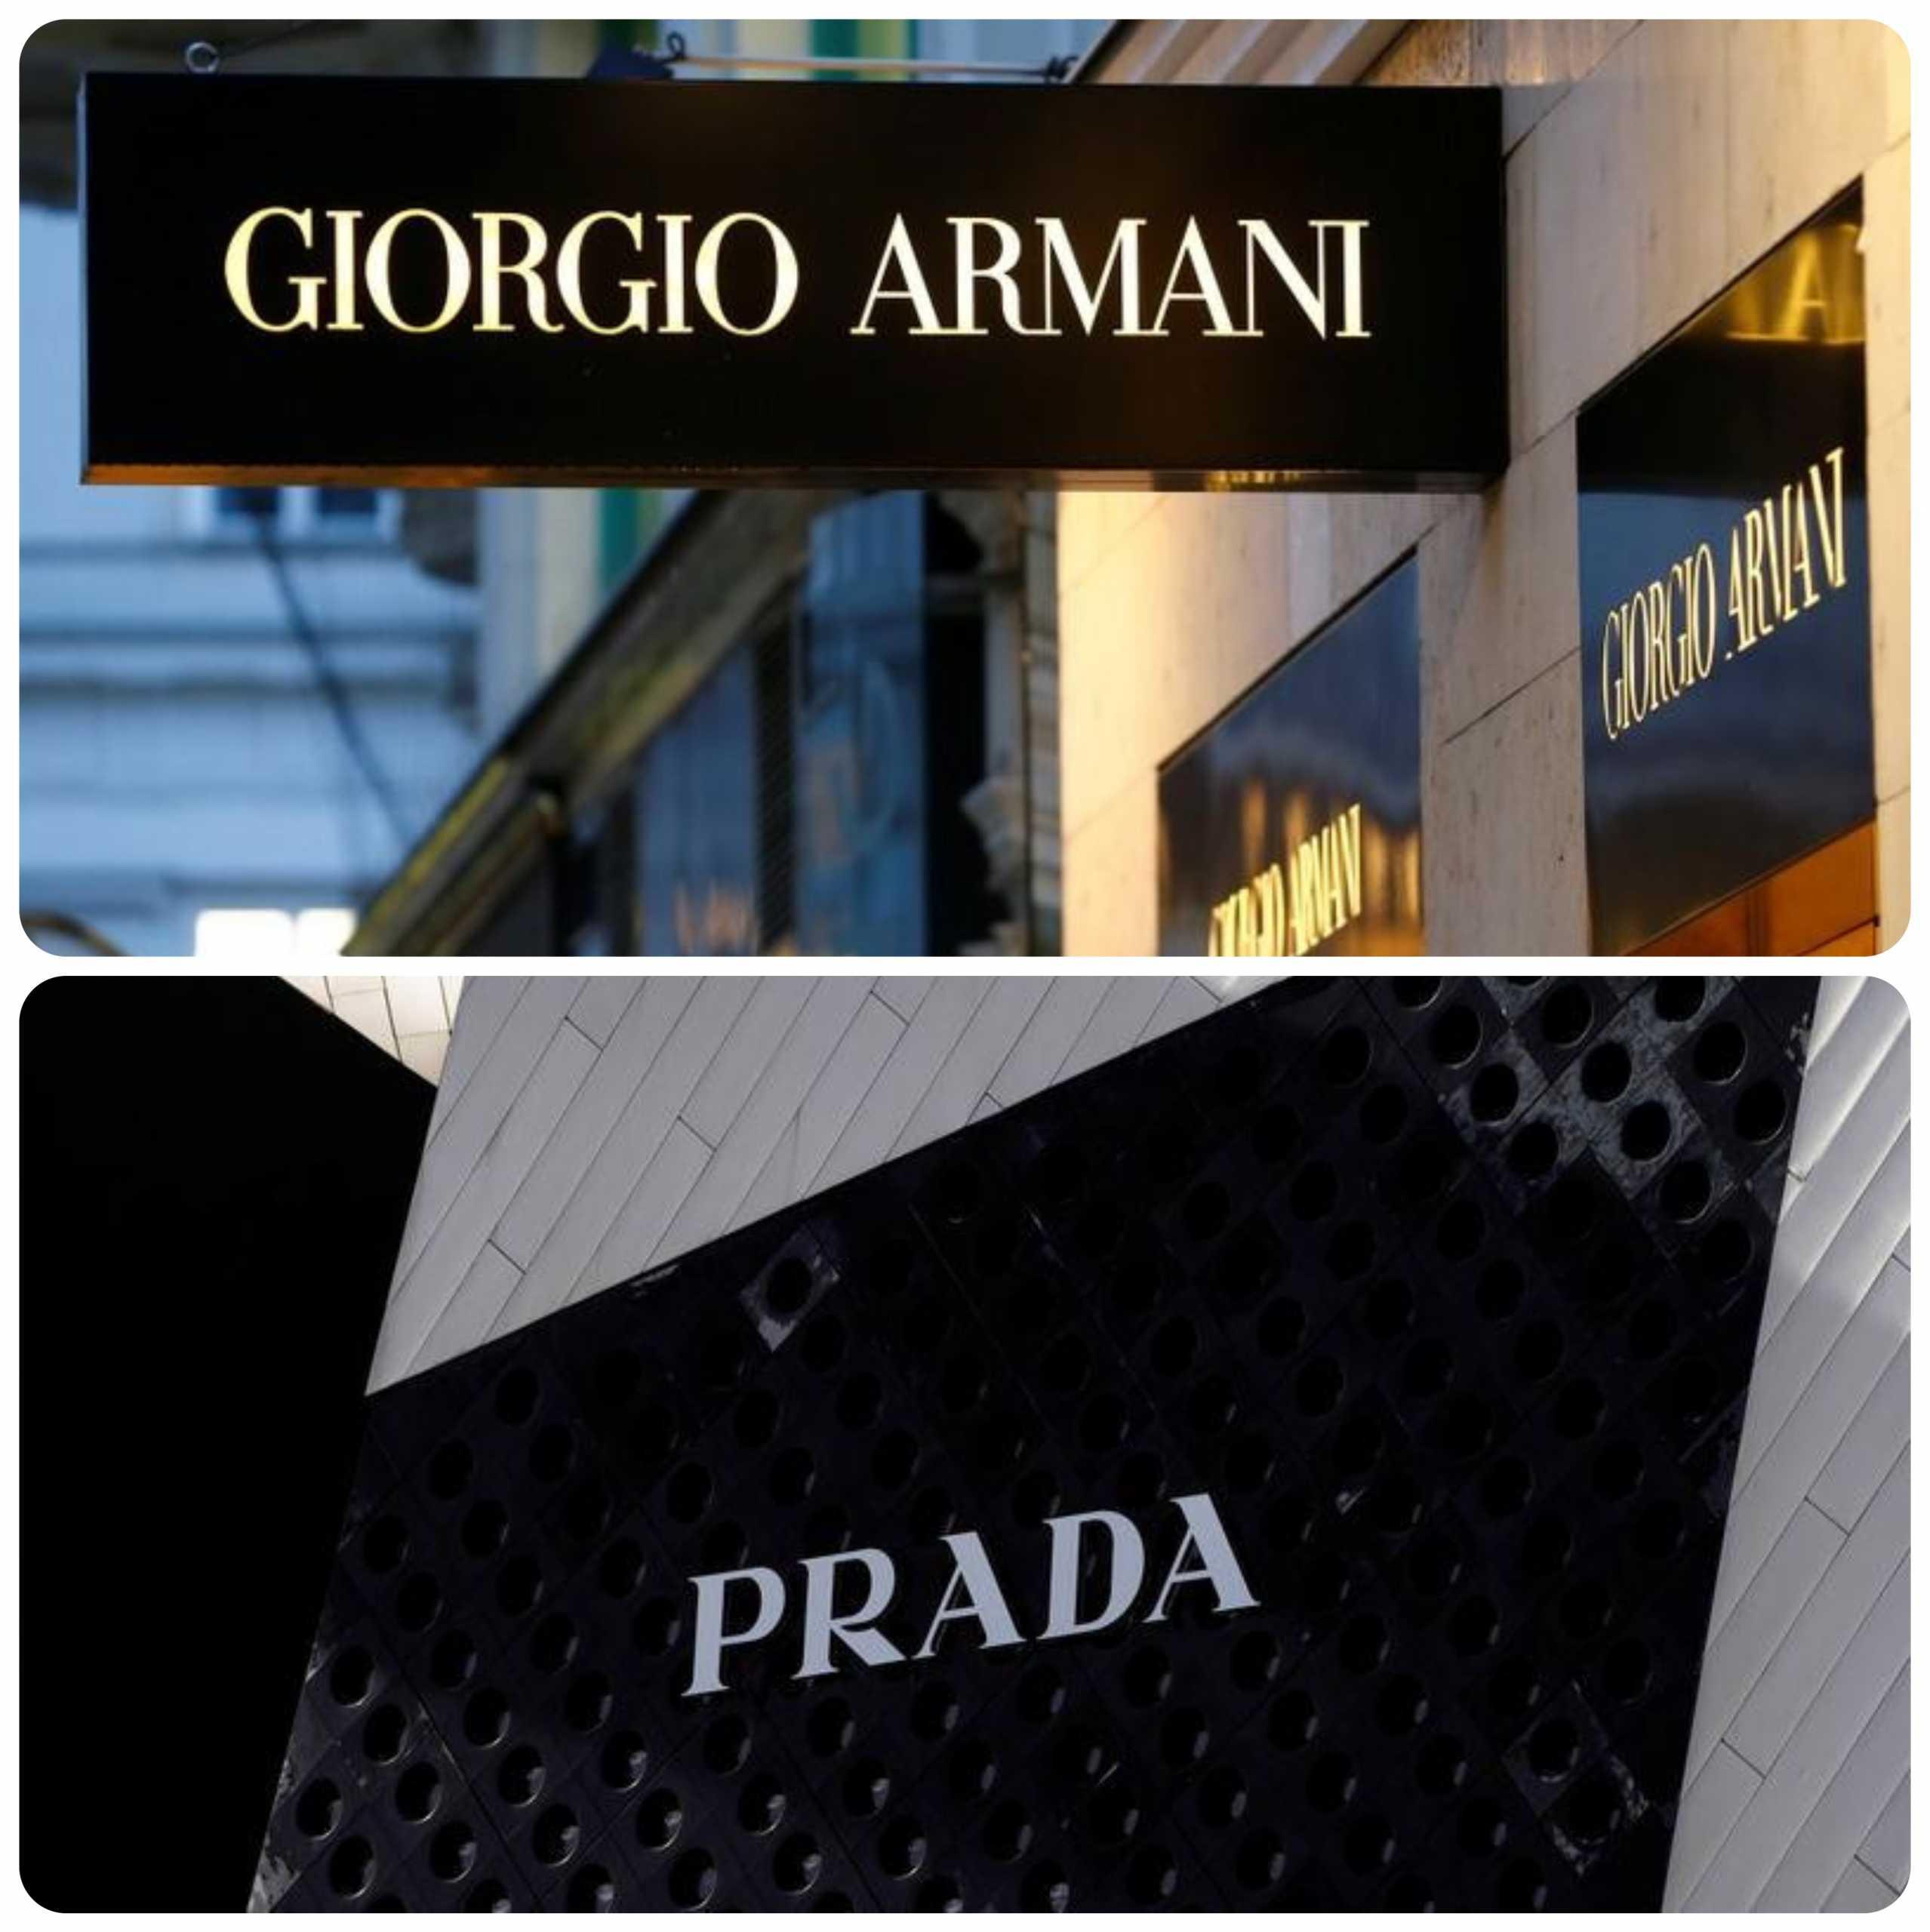 Armani και Prada δίνουν χώρους τους για να γίνουν εμβολιαστικά κέντρα